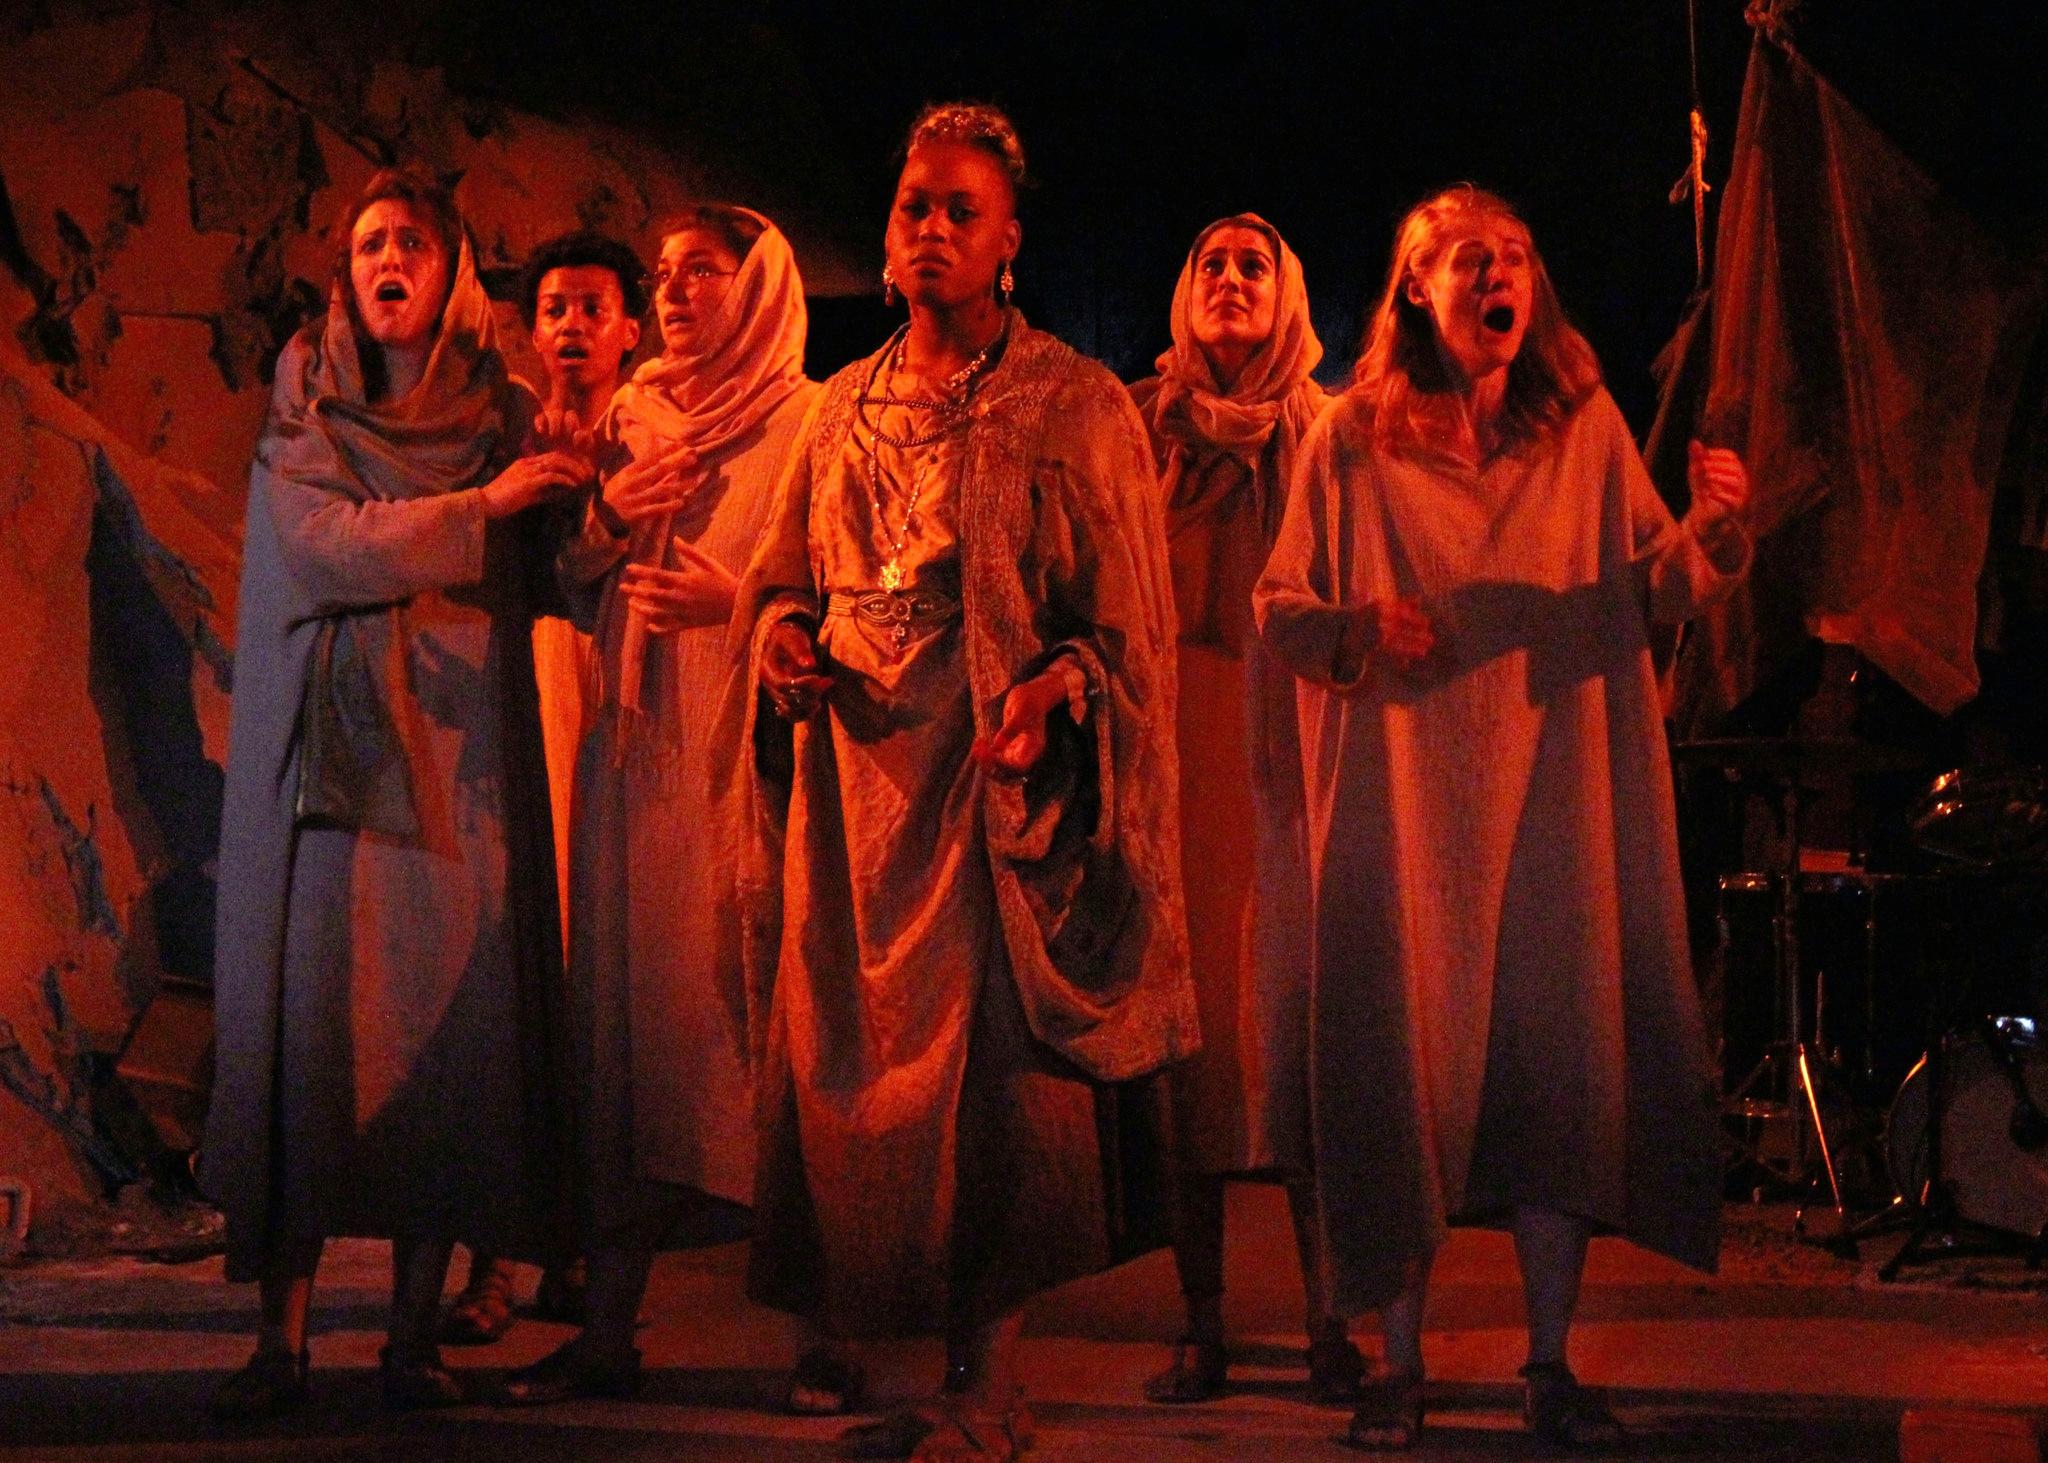 The Trojan women (Danielle Chaves, Kineta Kunutu, Evelyn Giovine, Antoinette Crowe-Legacy, Sohina Sidhu, Rachel Kenney) (photo: Leandro A. Zaneti)